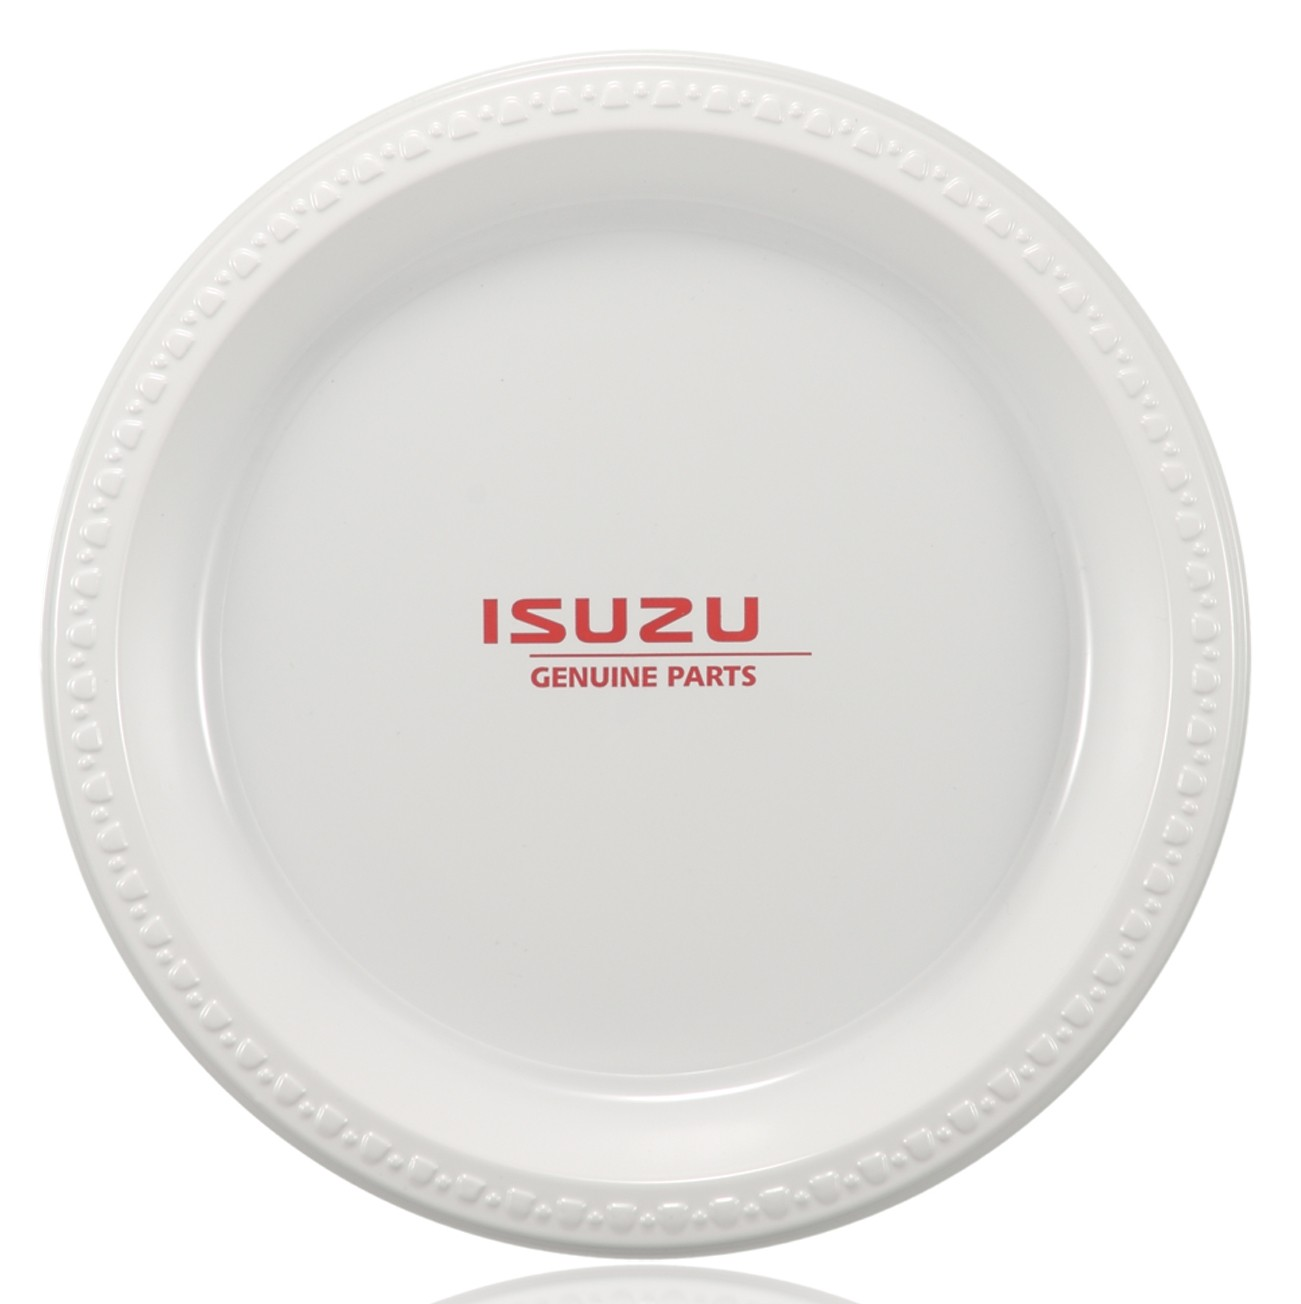 10  White Plastic Plates  sc 1 st  Wedding-Supplies.com & Printed 10